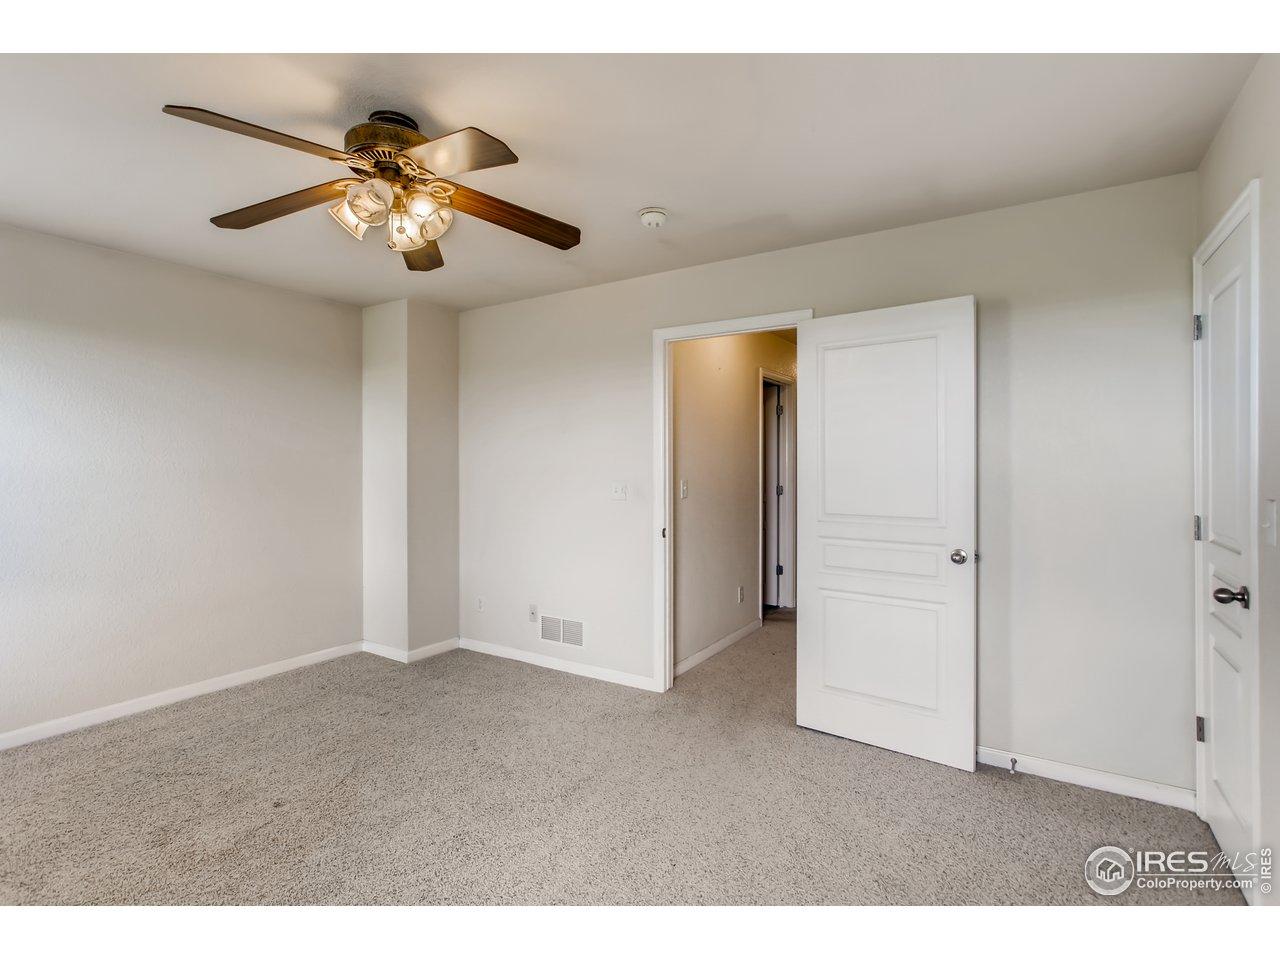 Large Primary Bedroom 15 x 11